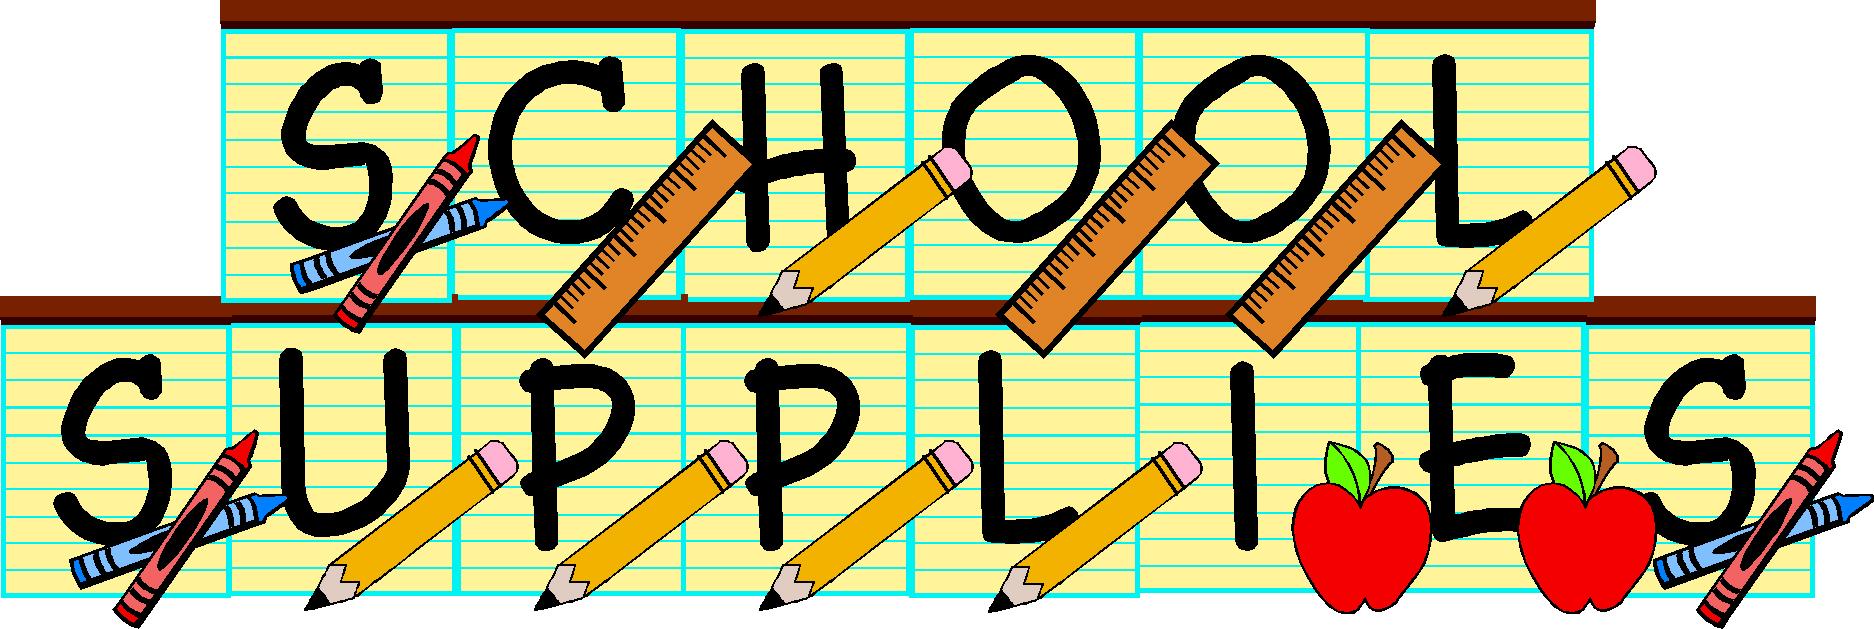 Clip Art School Supplies Clipart school supplies drive clipart kid mission registration transportation visting winship